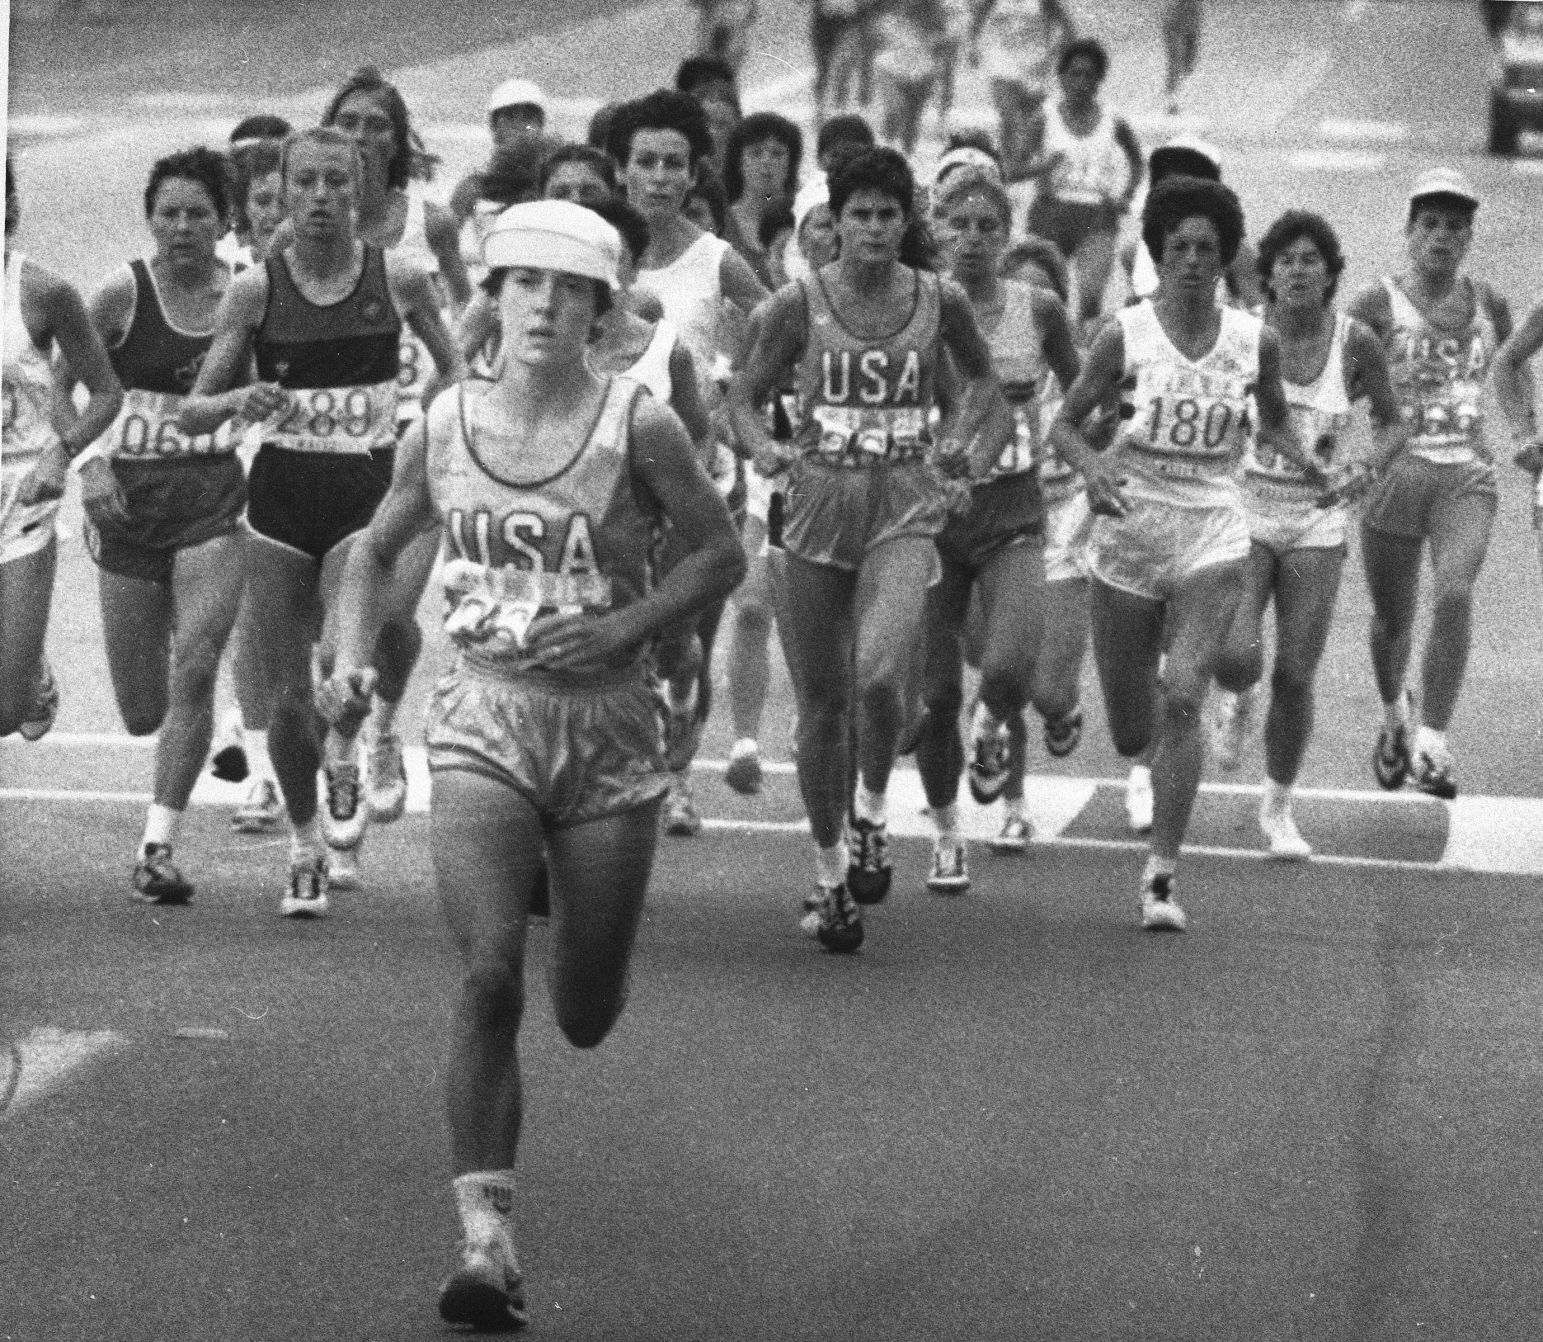 Watch Joan Benoit Samuelson Olympic medal in marathon running video